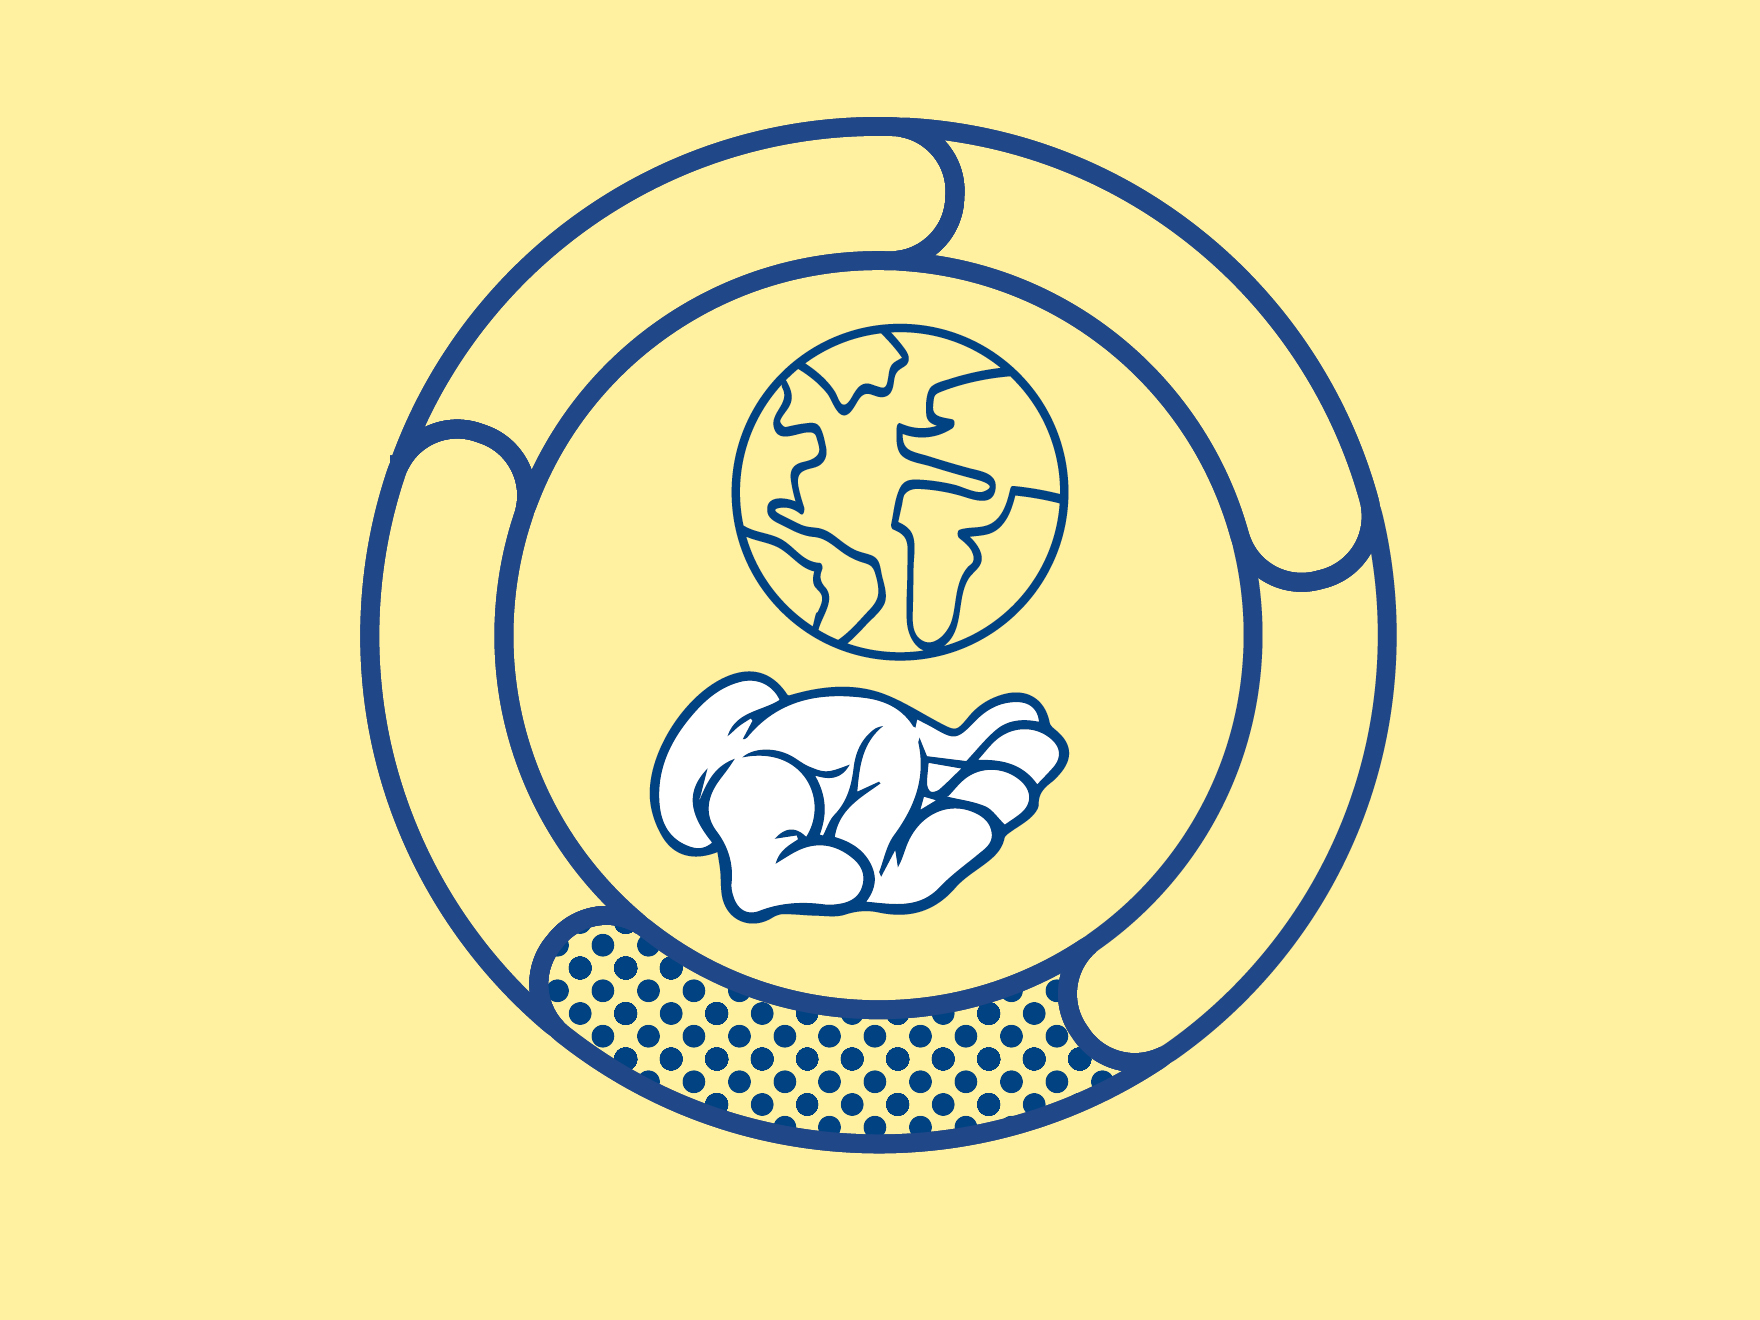 Устойчив бизнес